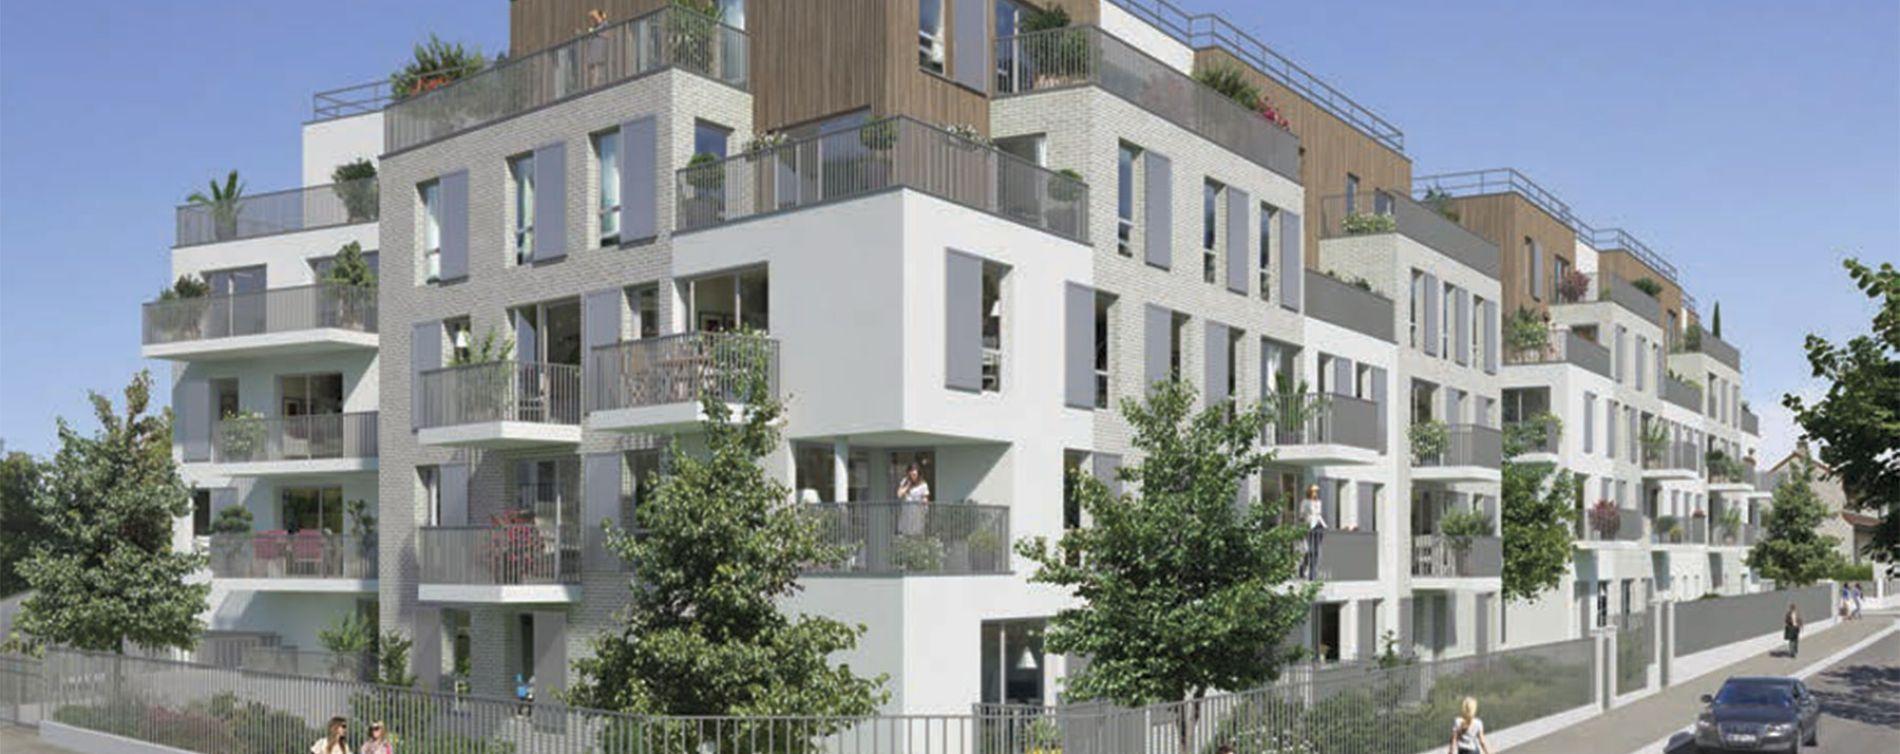 s quen 39 ciel livry gargan programme immobilier neuf n 214115. Black Bedroom Furniture Sets. Home Design Ideas